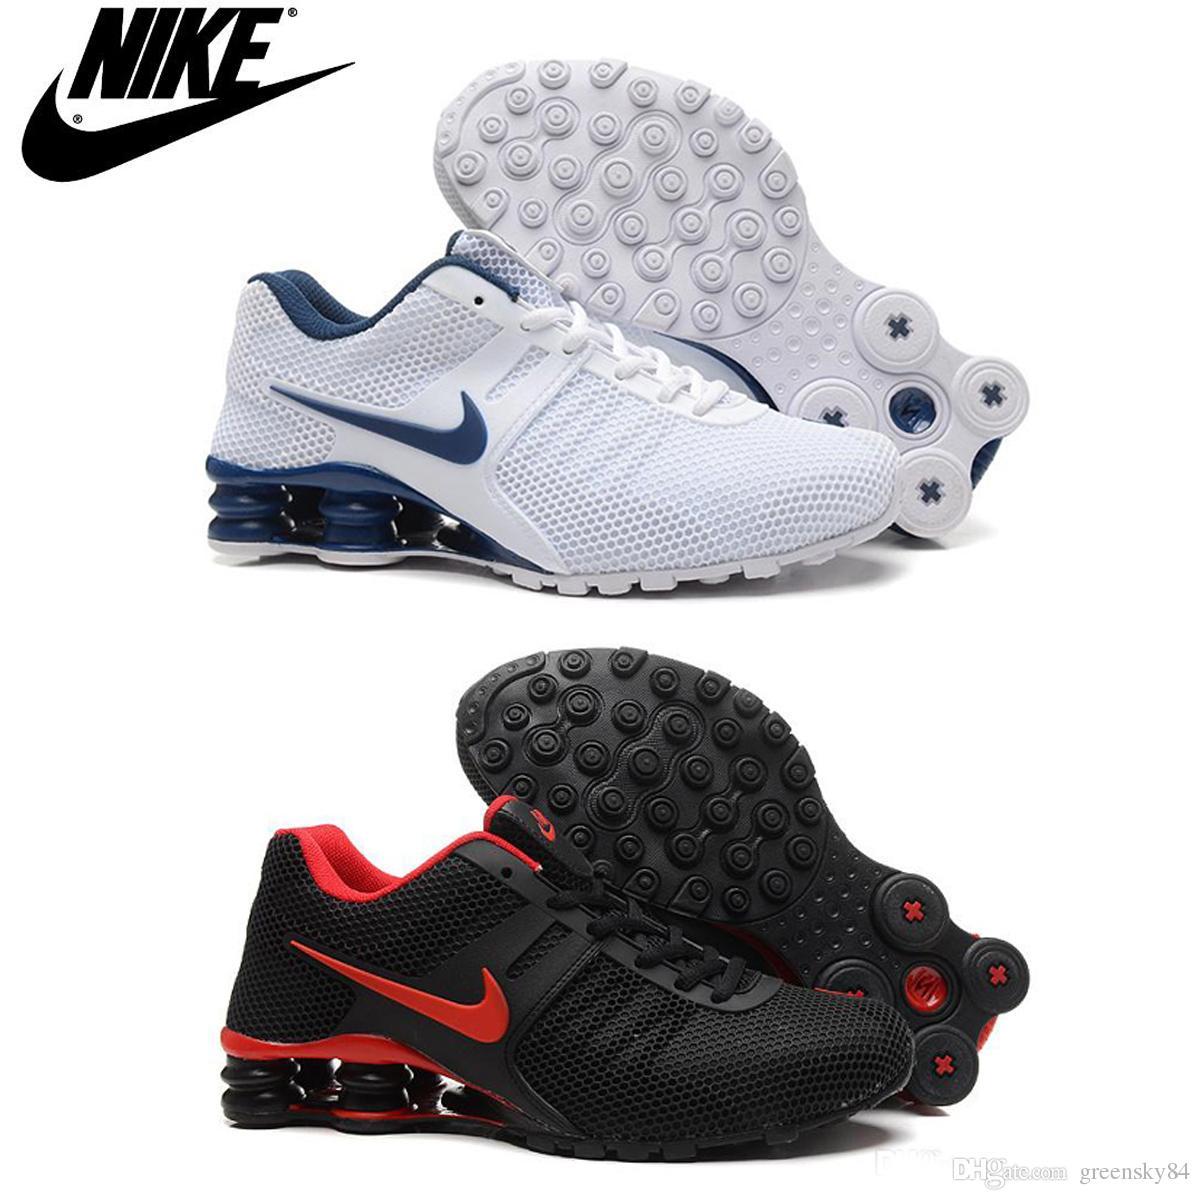 Acheter Nike Shox Turbo 807 Kpu Chaussures De Course, En Gros Nike